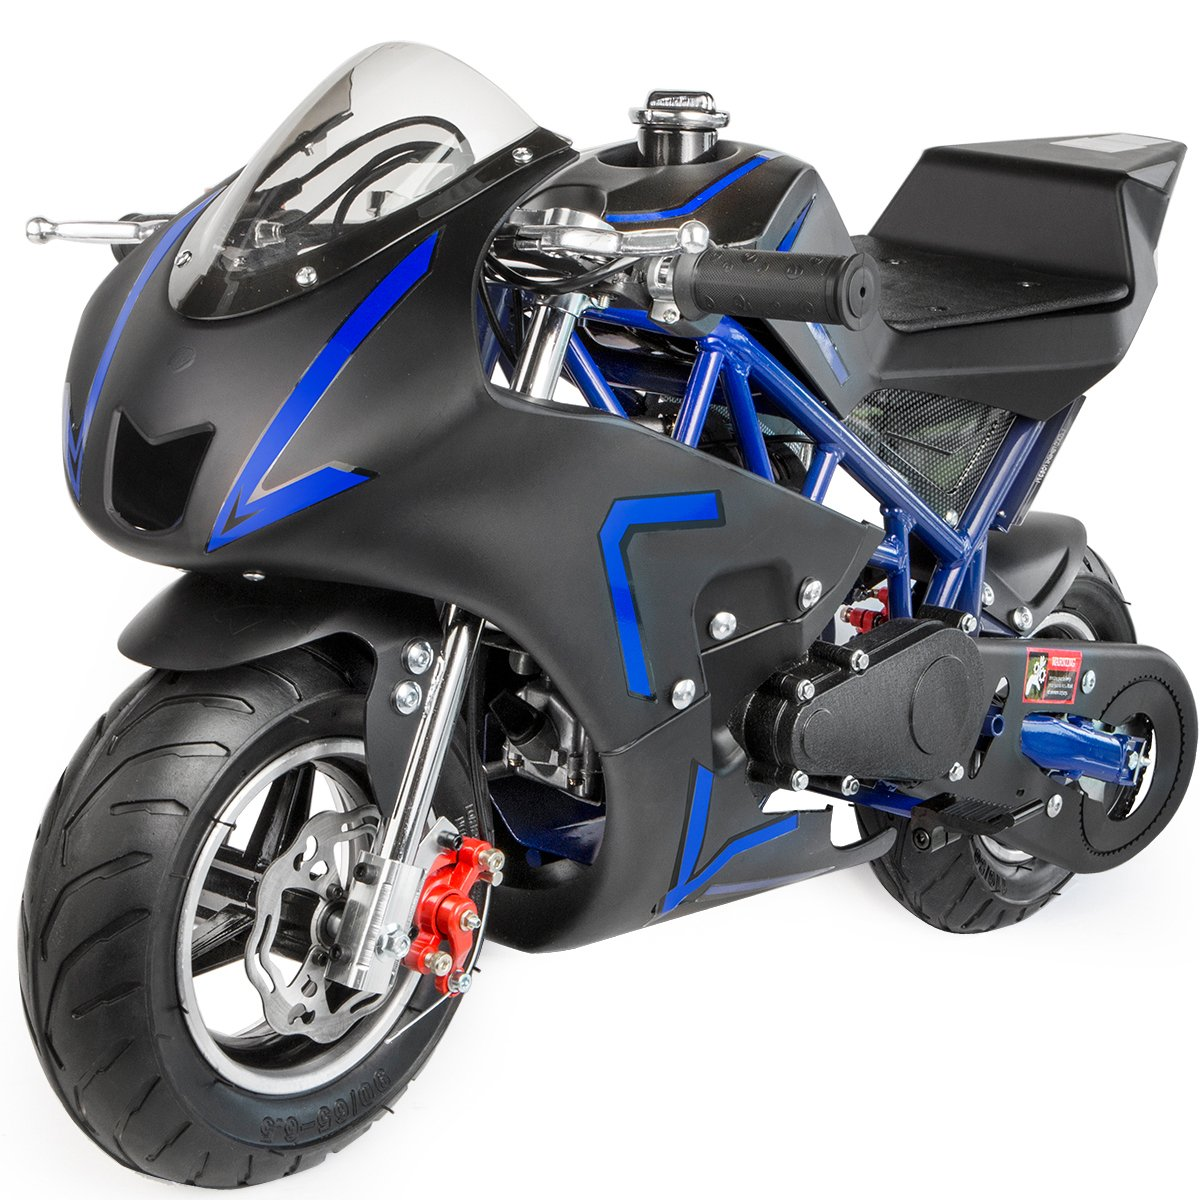 gas motorcycle pocket ride 40cc mini bike power stroke scooter motor xtremepowerus motobike engine moto motorbike epa amazon powered bikes